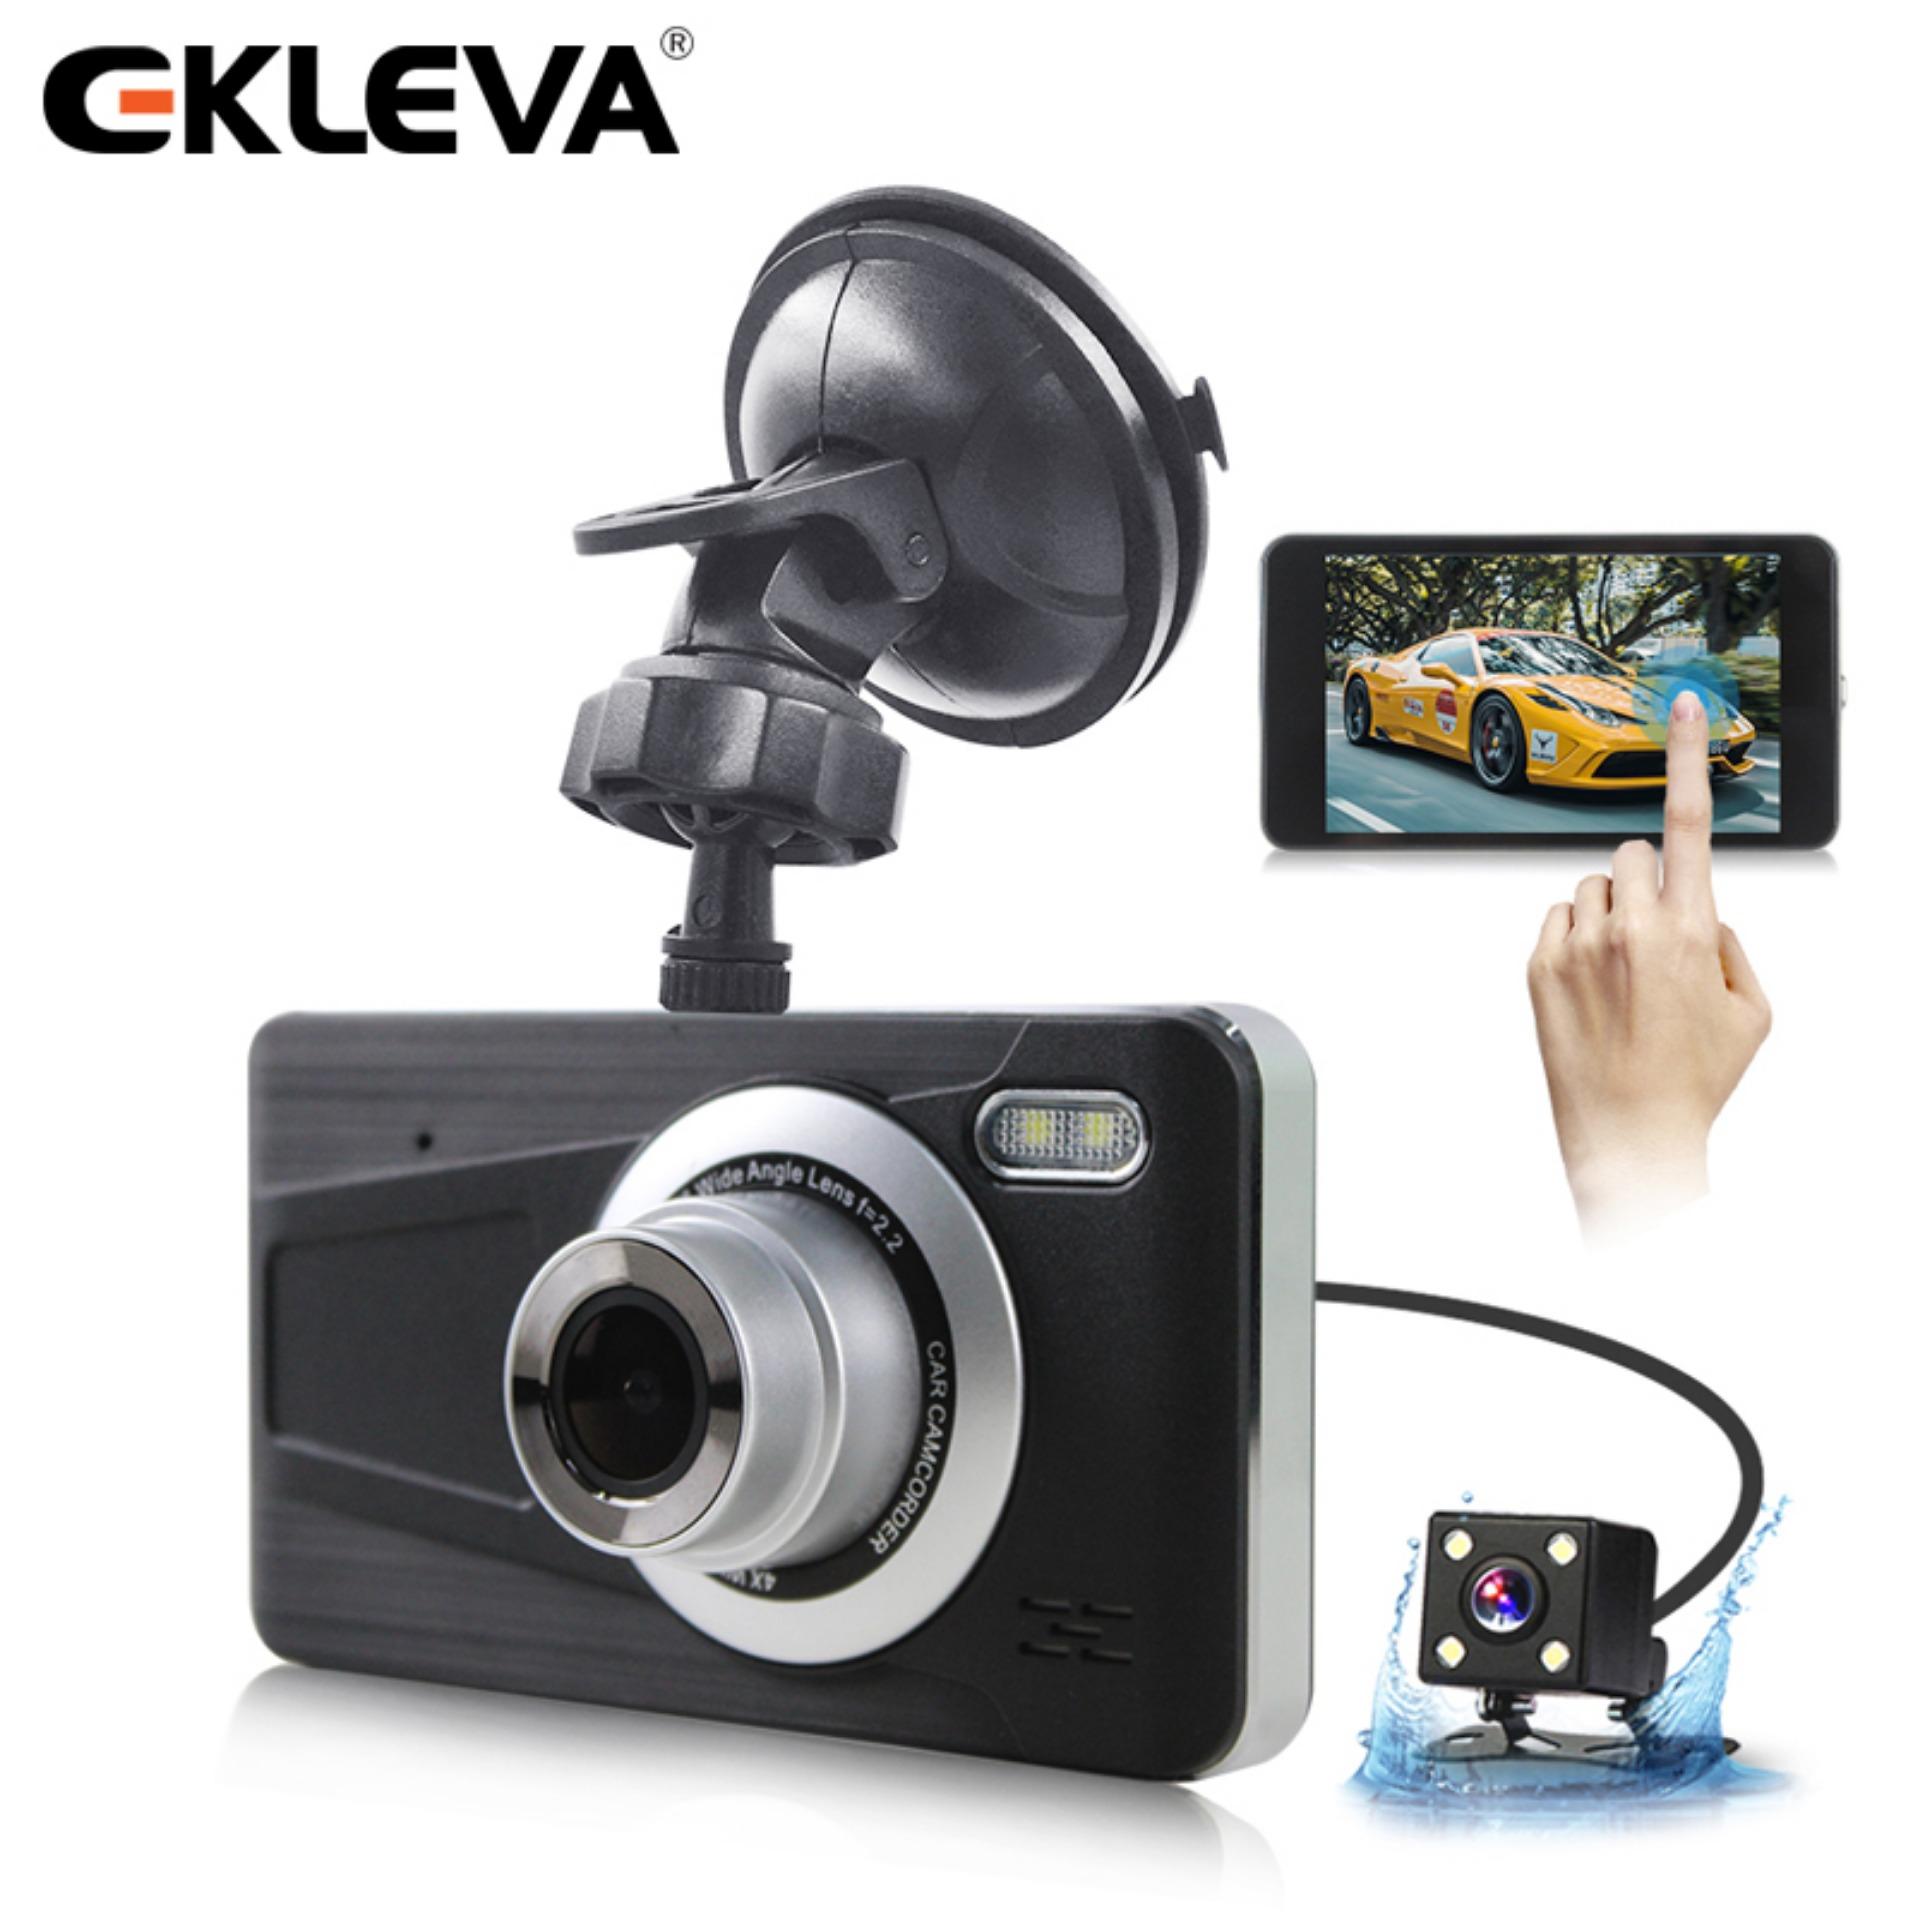 Car Camera Dash Cam Video Recorder DVR Car Backup Camera with 1080P HD Parking Mode Motion Detection Night Vision Loop Recording Gravity Sensor Dashboard Camera